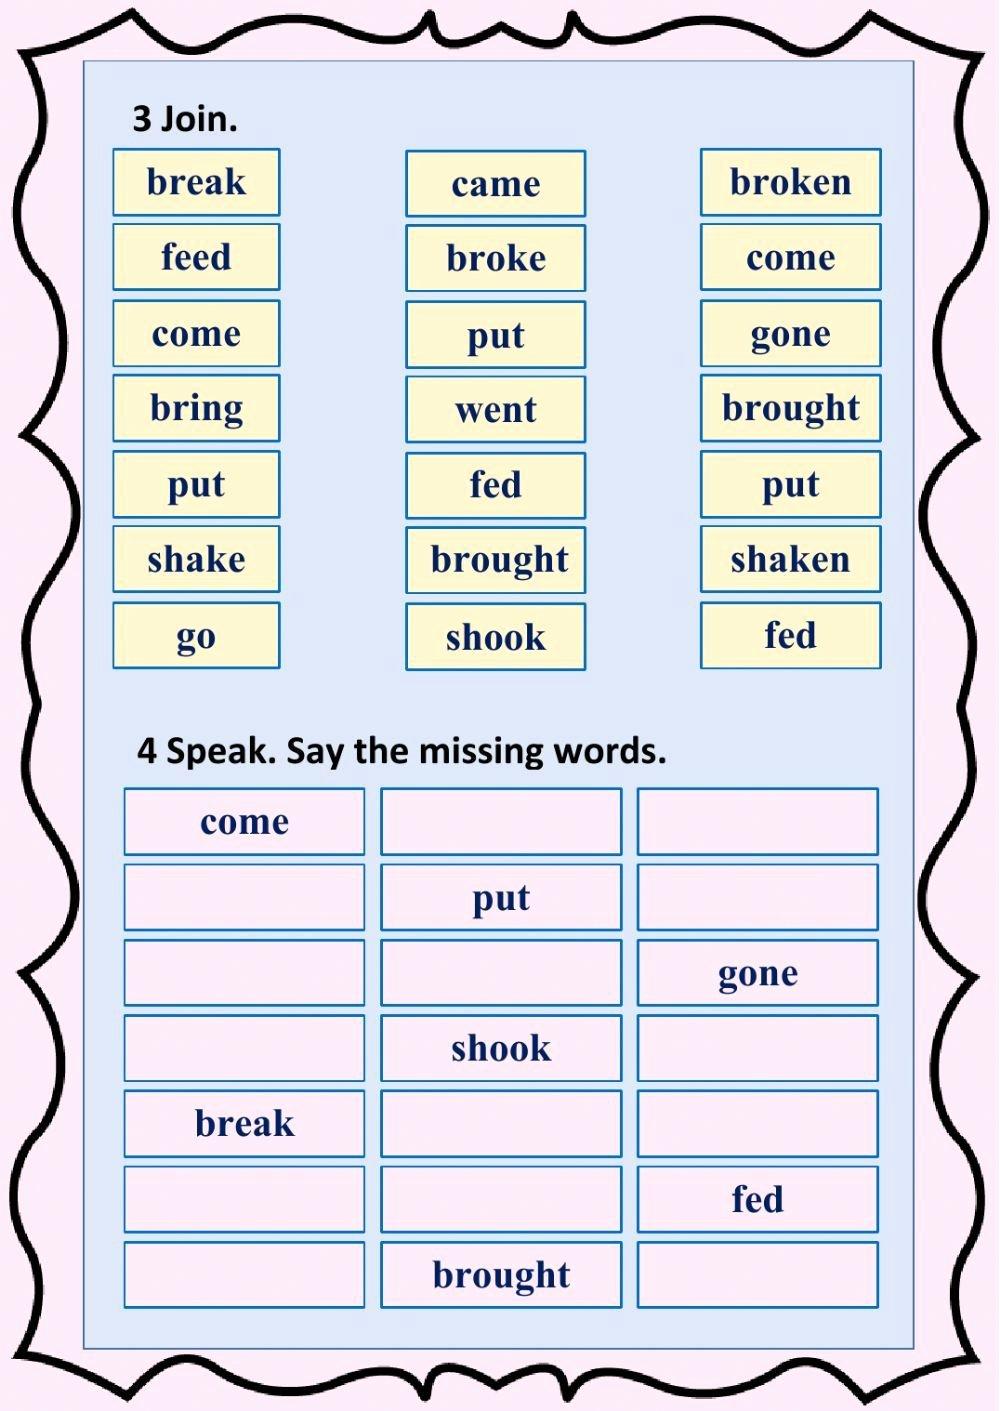 Irregular Verbs Worksheet Pdf Best Of Irregular Verbs Interactive and Able Worksheet